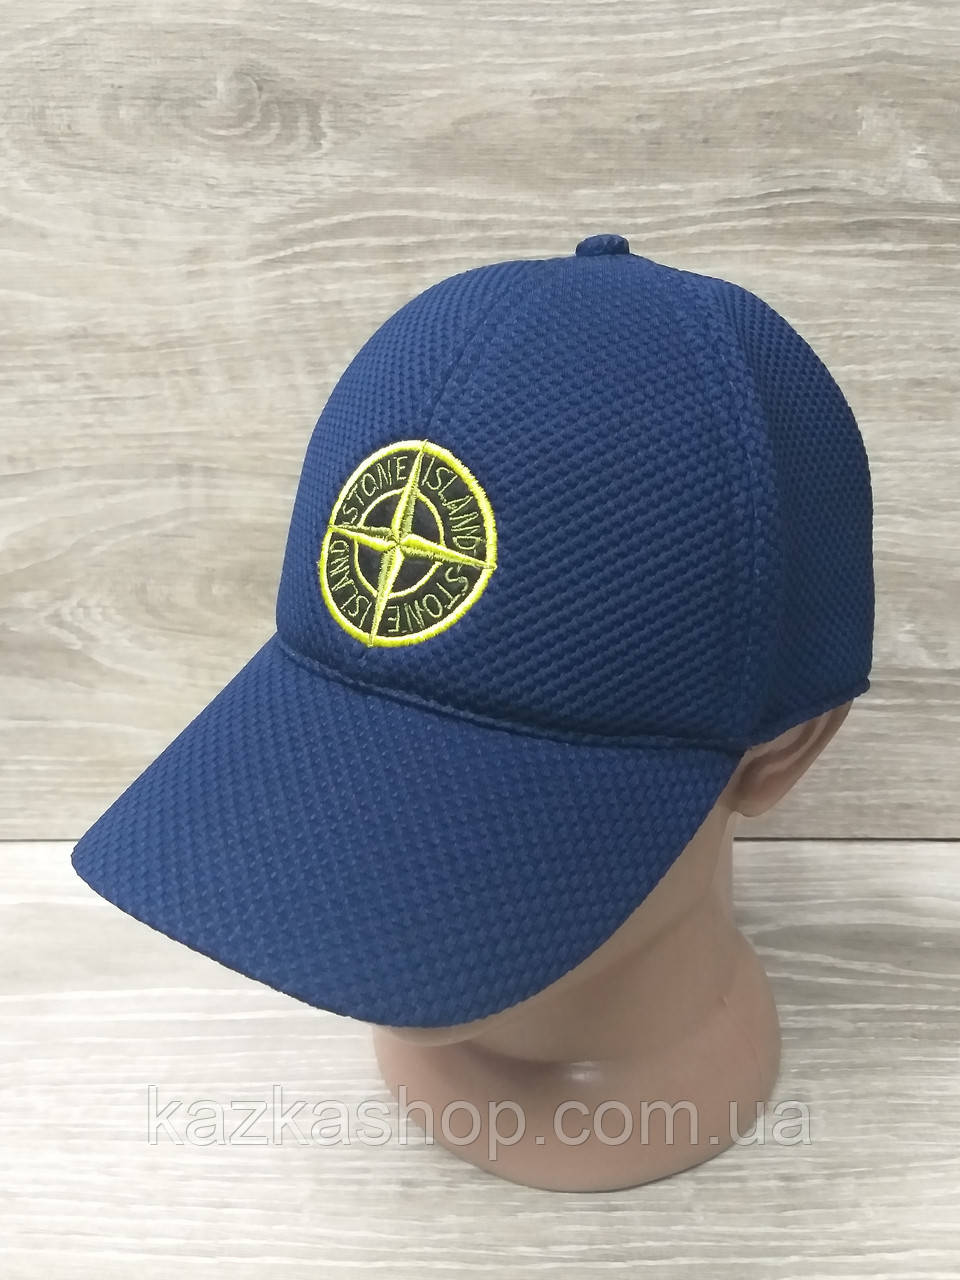 Мужская бейсболка, кепка, материал лакоста, с вышивкой, размер 57-58, на регуляторе